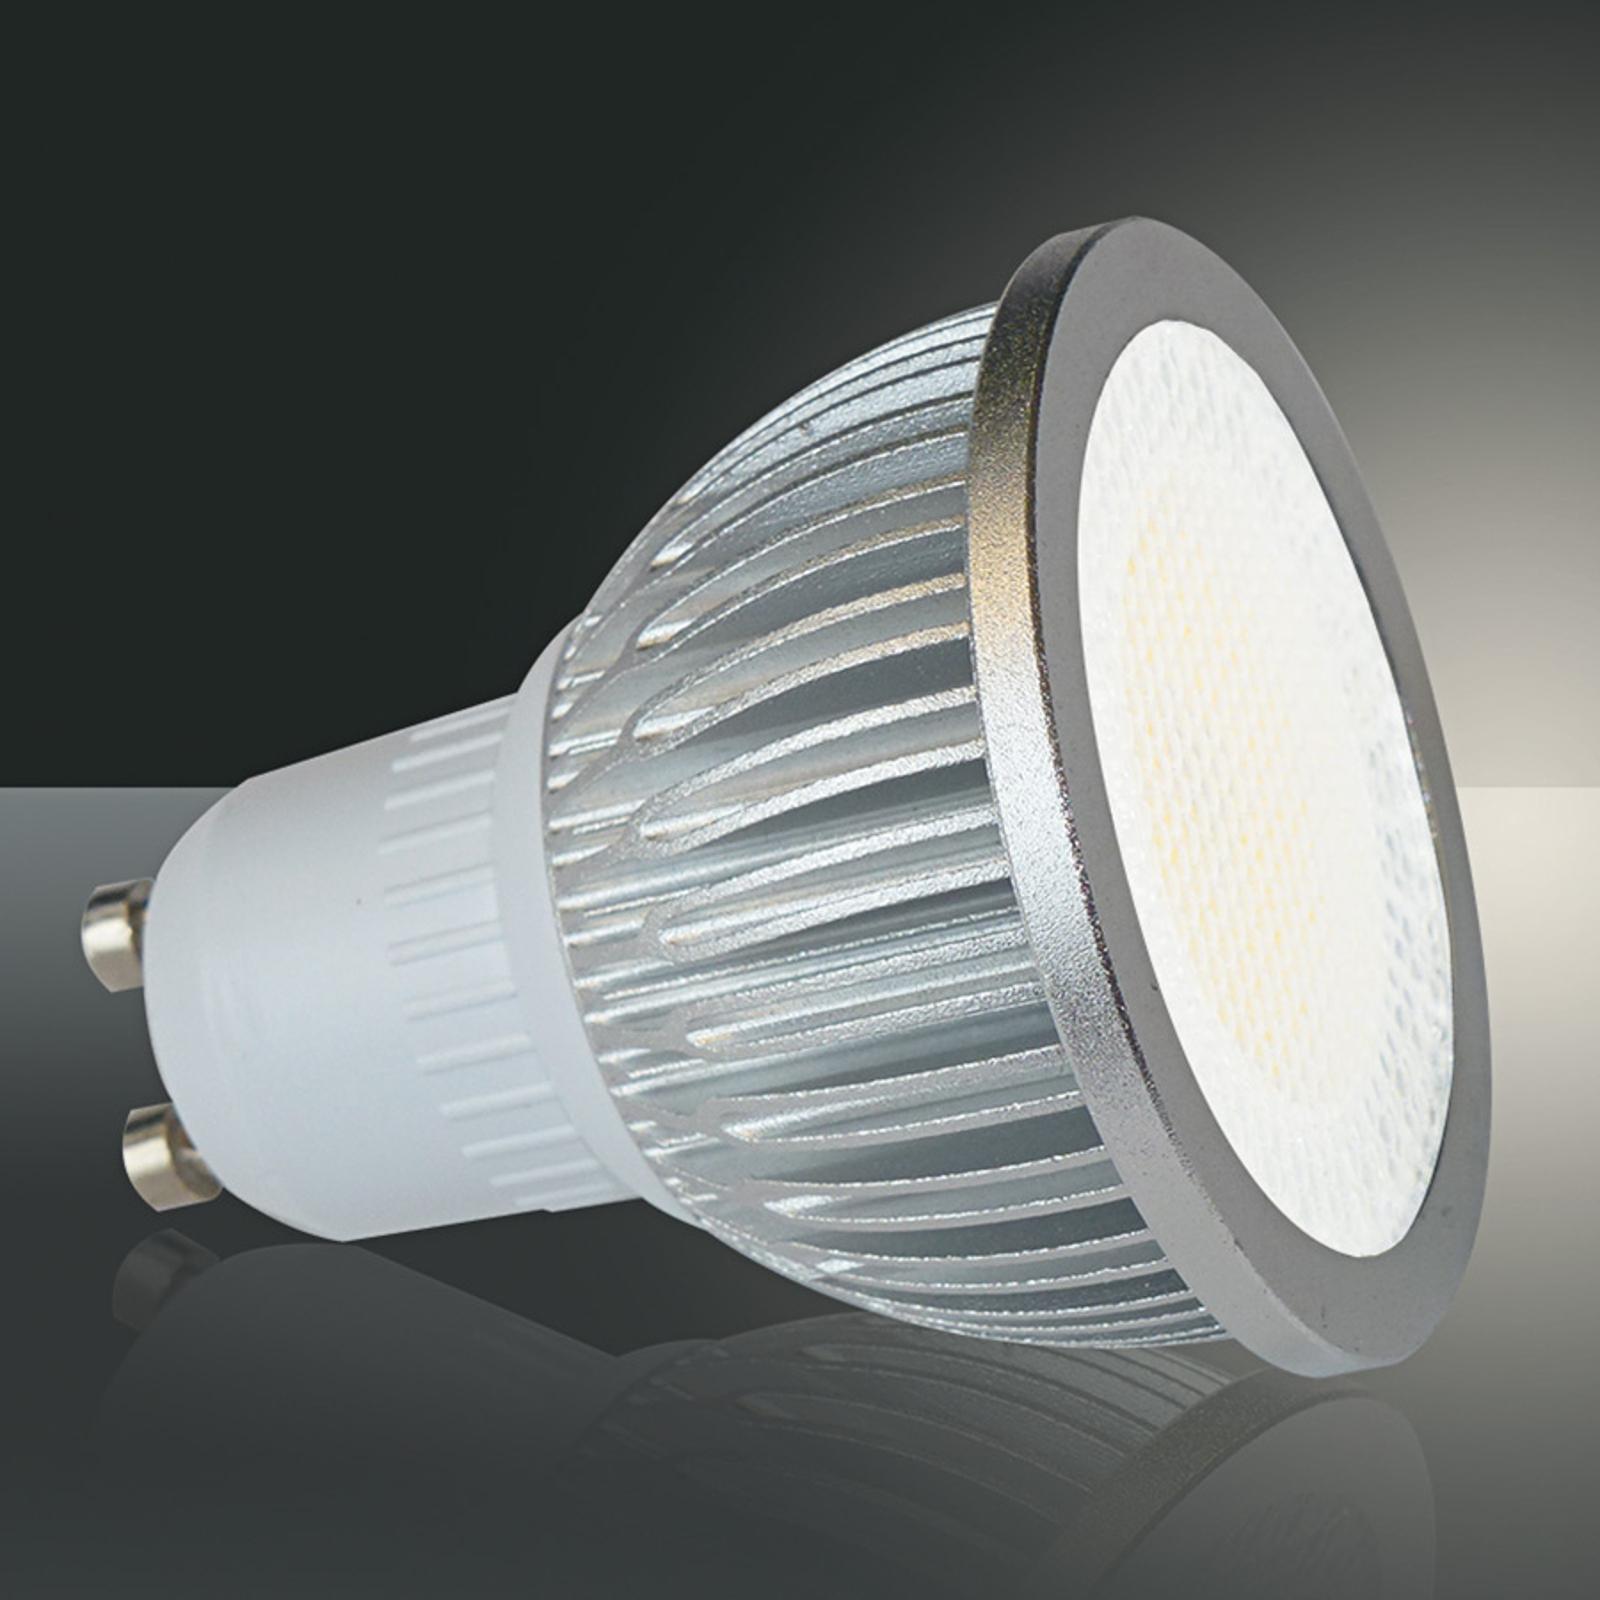 GU10 5W 829 230V LED-reflectorlamp, 90°